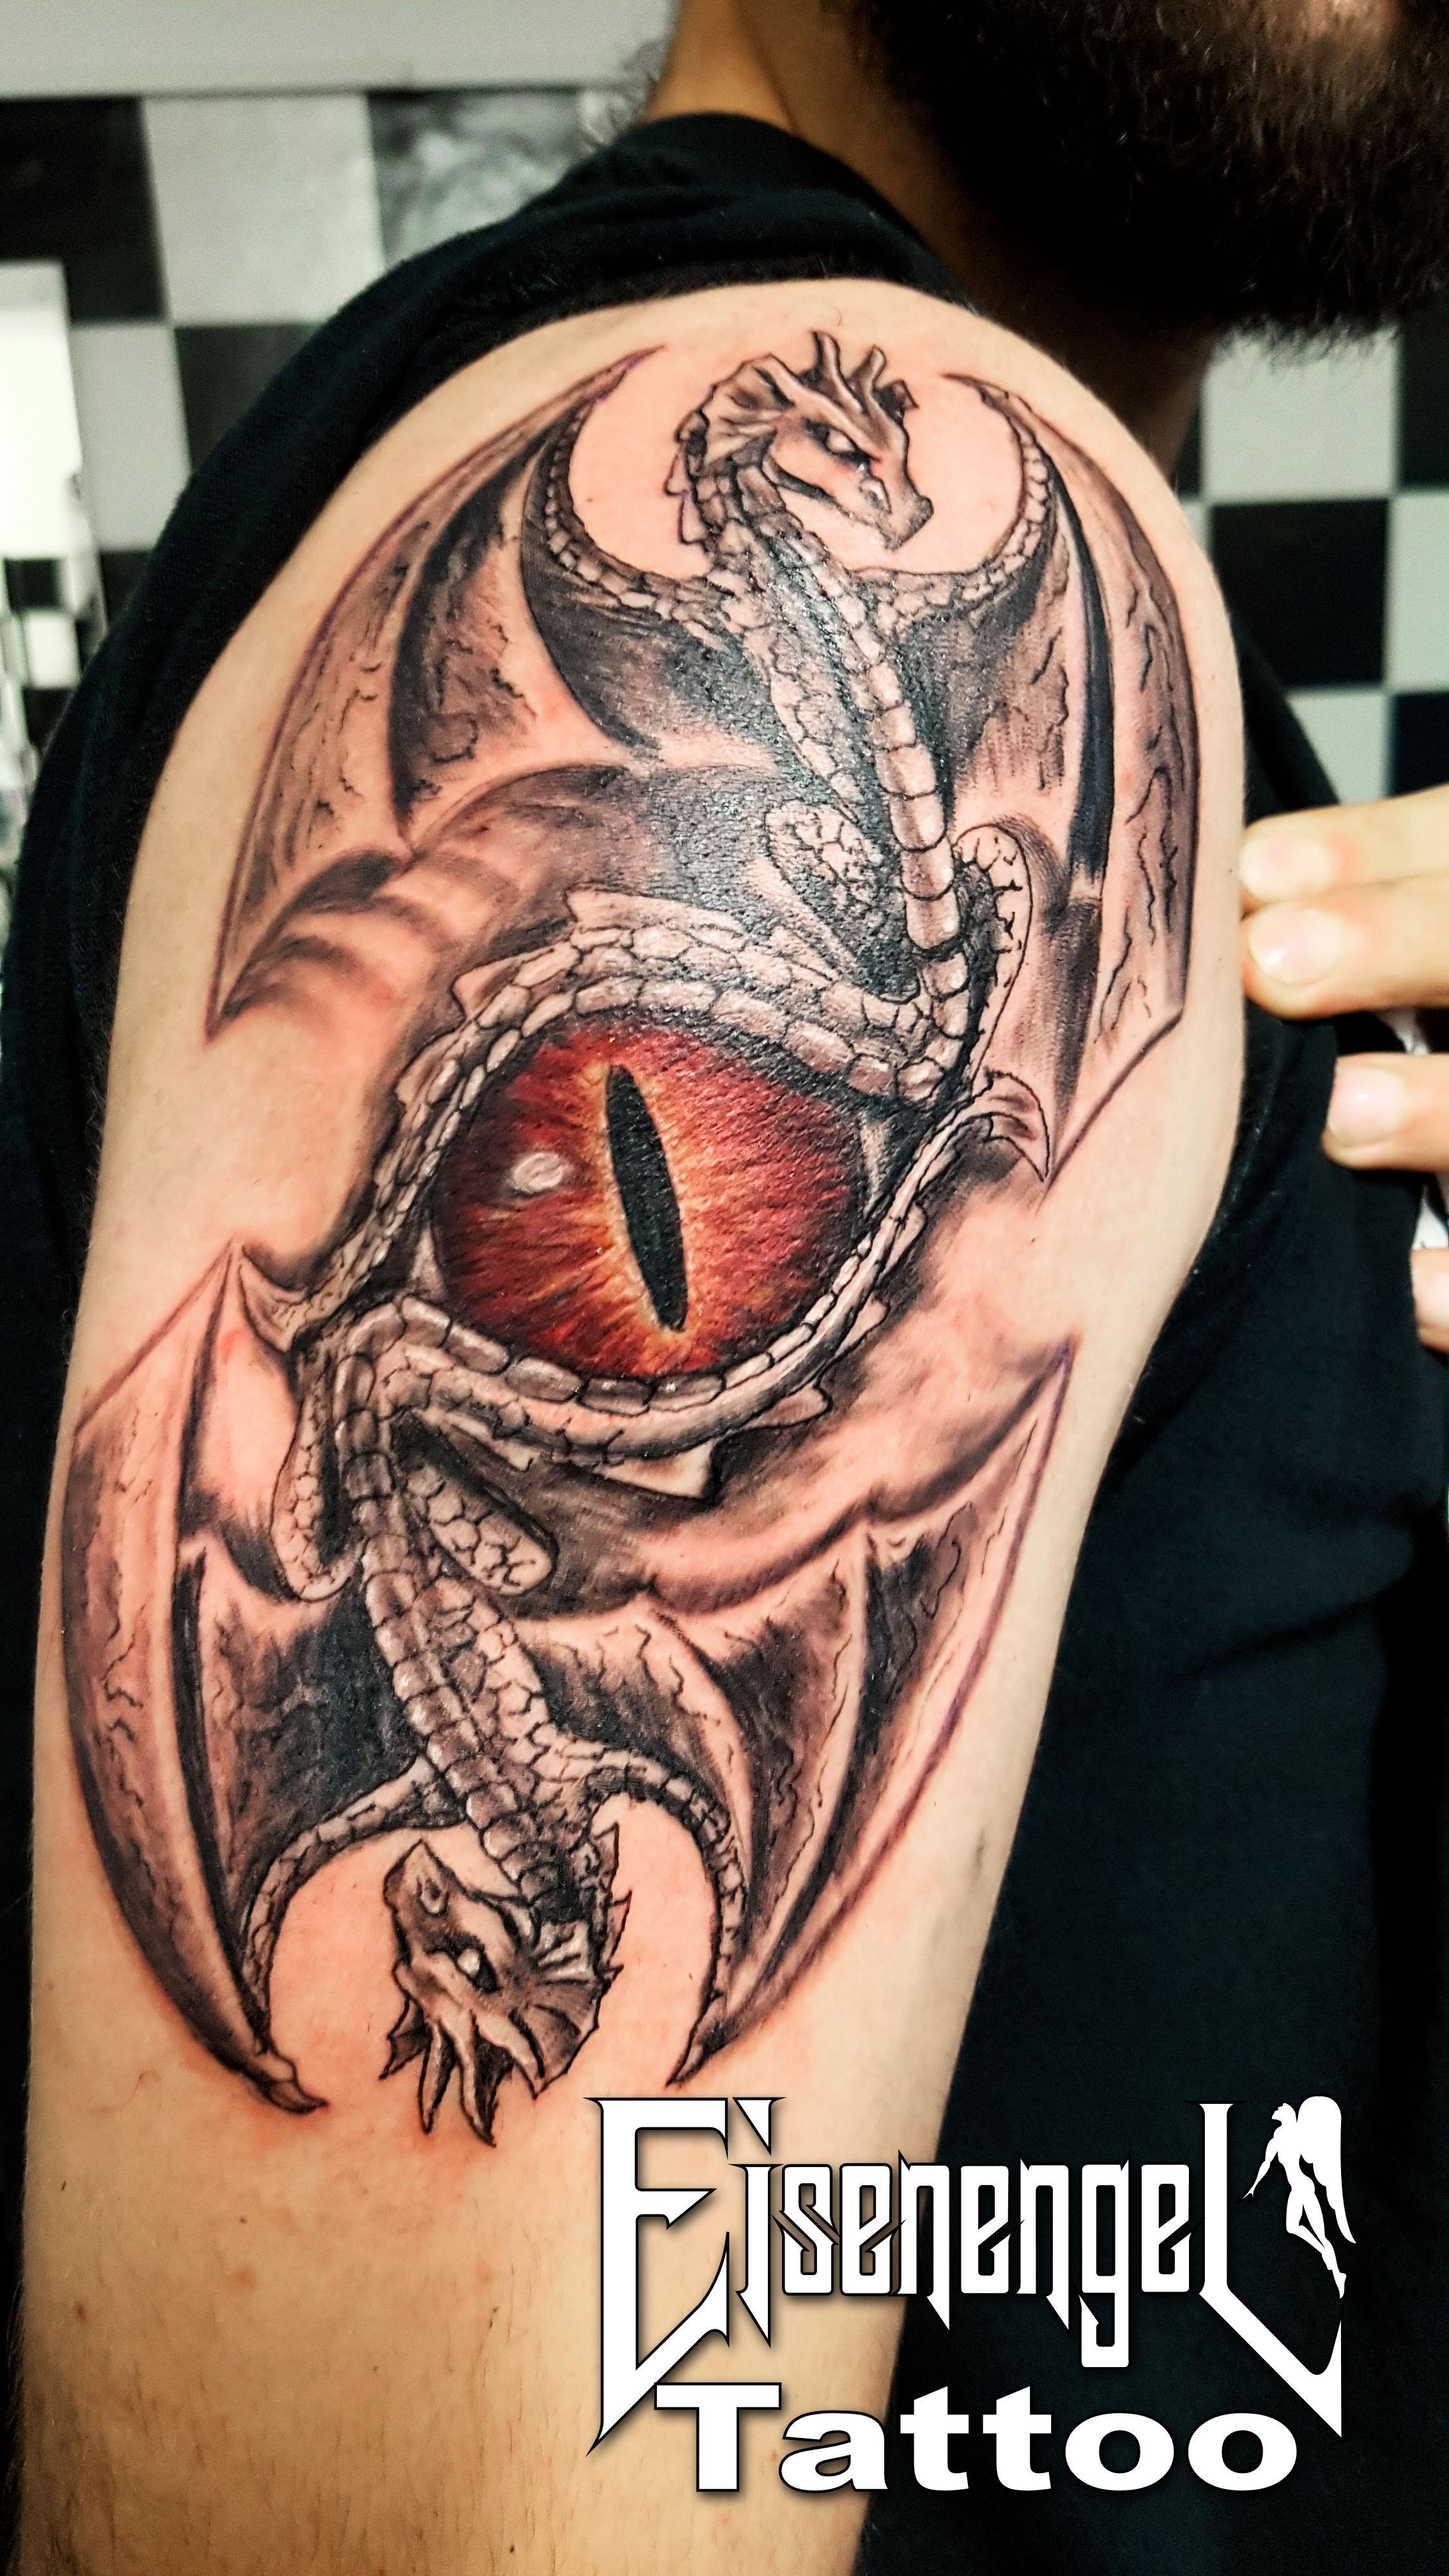 tattoo_drachenauge1.jpg